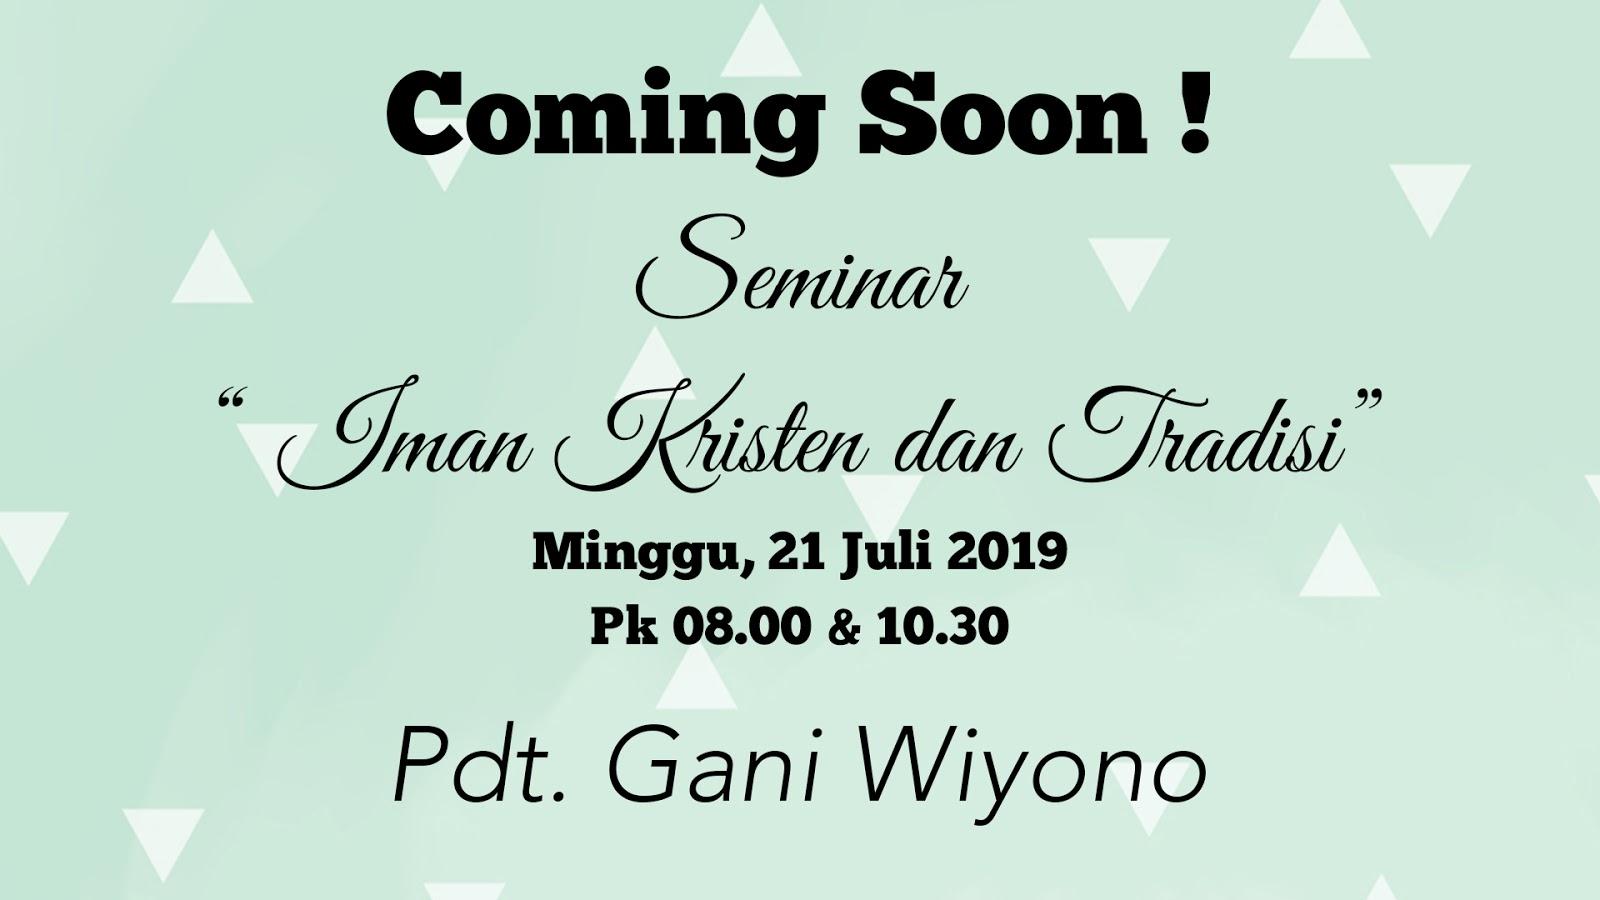 Seminar GSJA Sword 21-07-2019 Pdt. Gani Wiyono